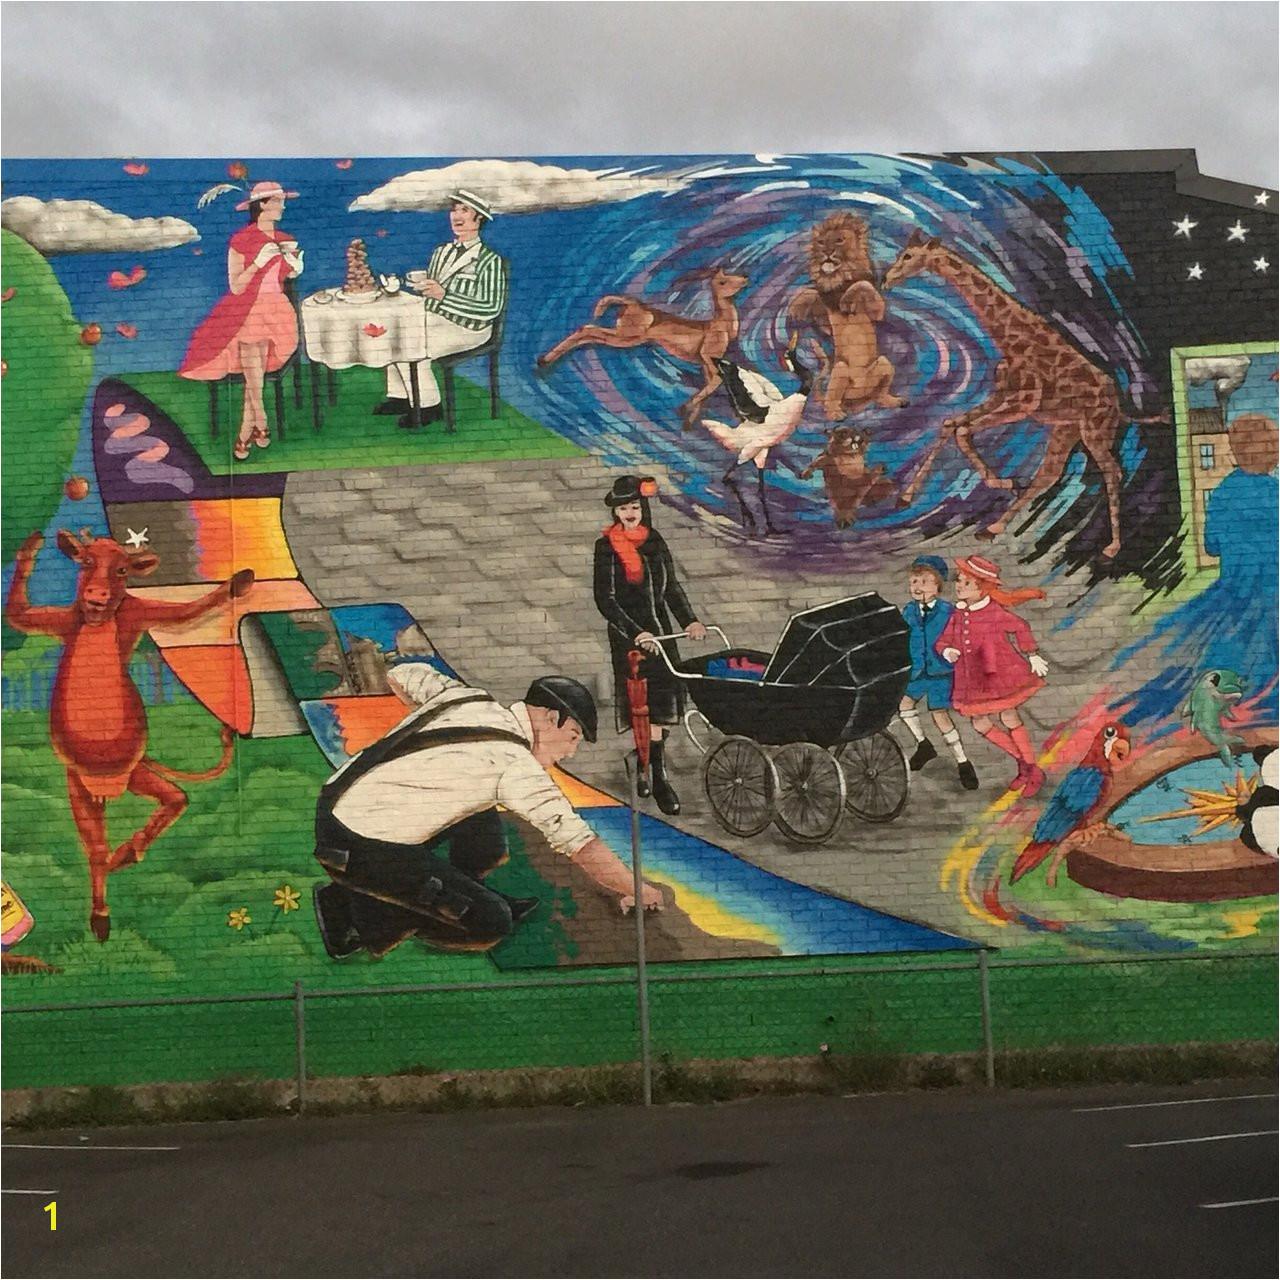 Rv Murals the Wharf Rv Park Bewertungen Fotos & Preisvergleich Maryborough